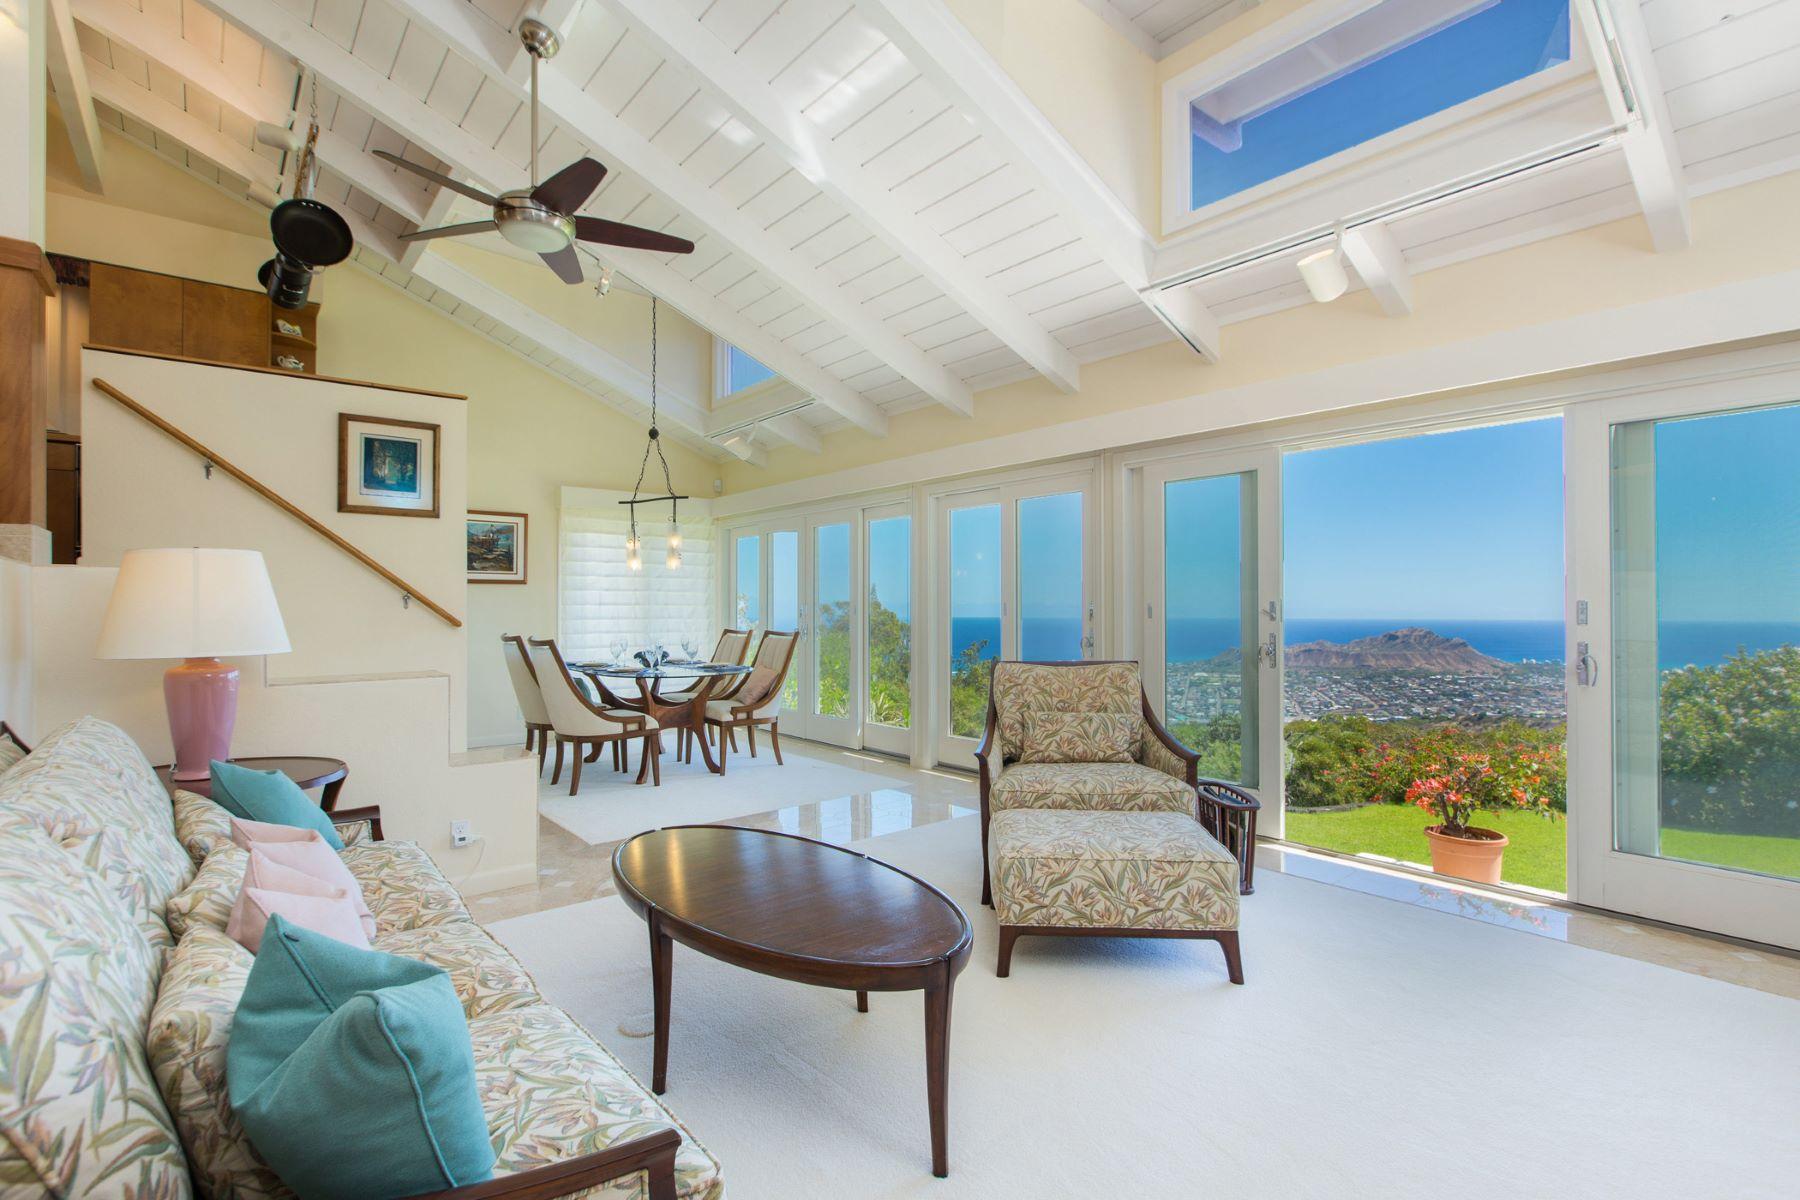 Additional photo for property listing at Honolulu Mountaintop Elegance 2491 Halekoa Drive Honolulu, Hawaii 96821 United States